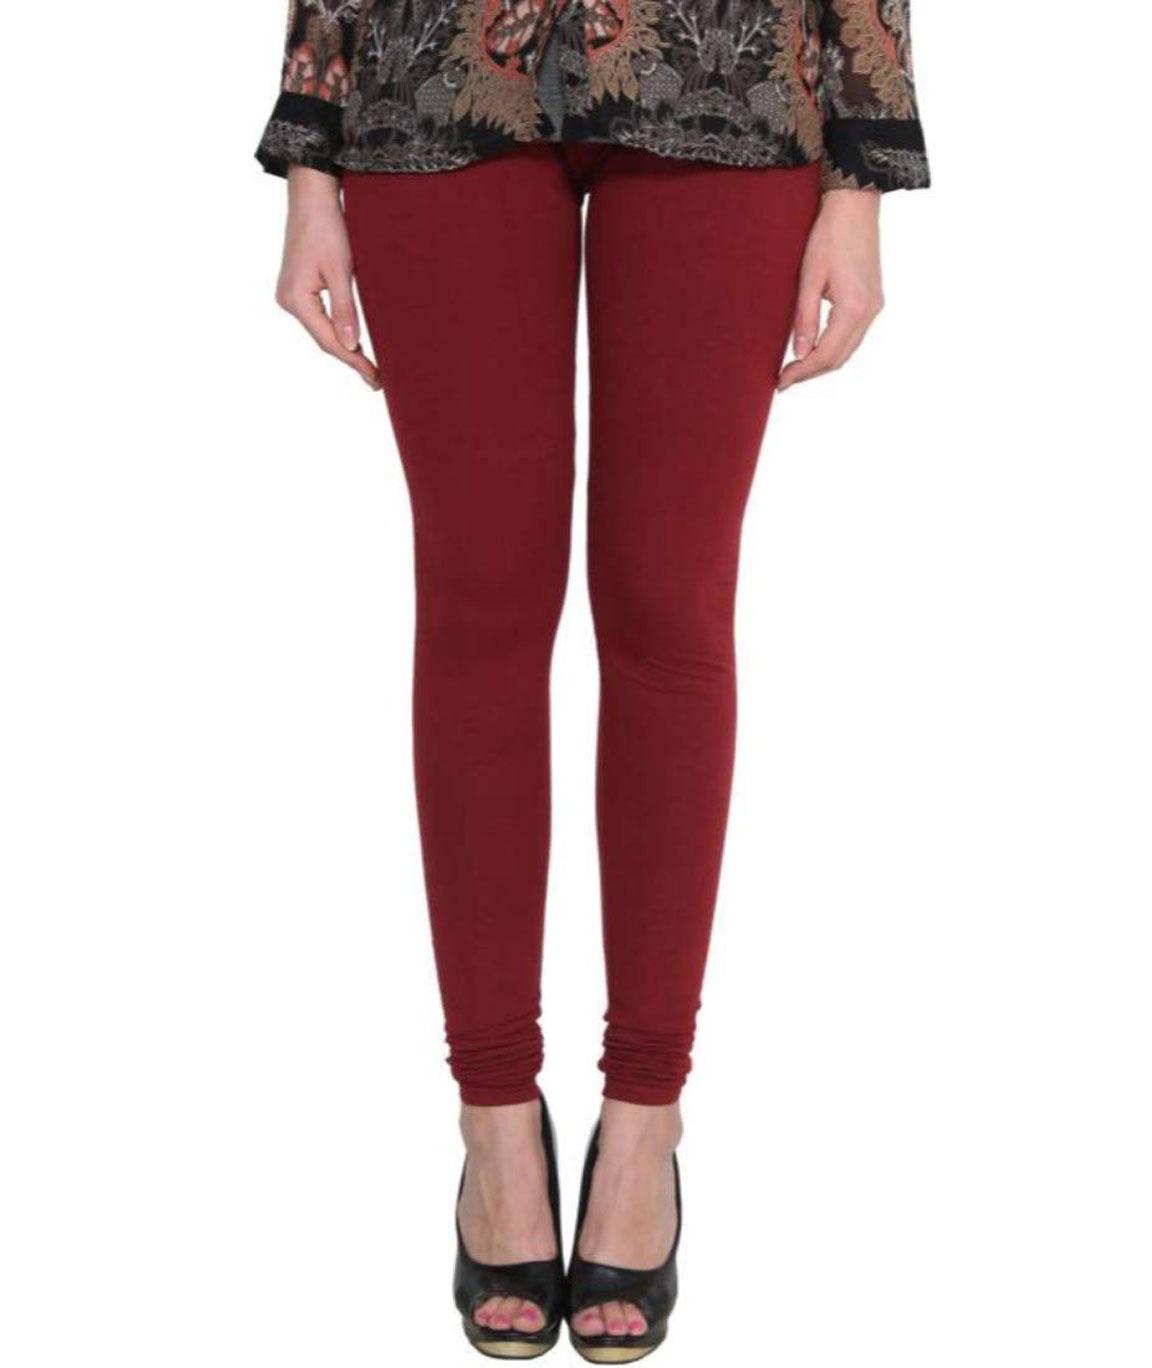 Swag Wear Churidar Legging(mehroon)